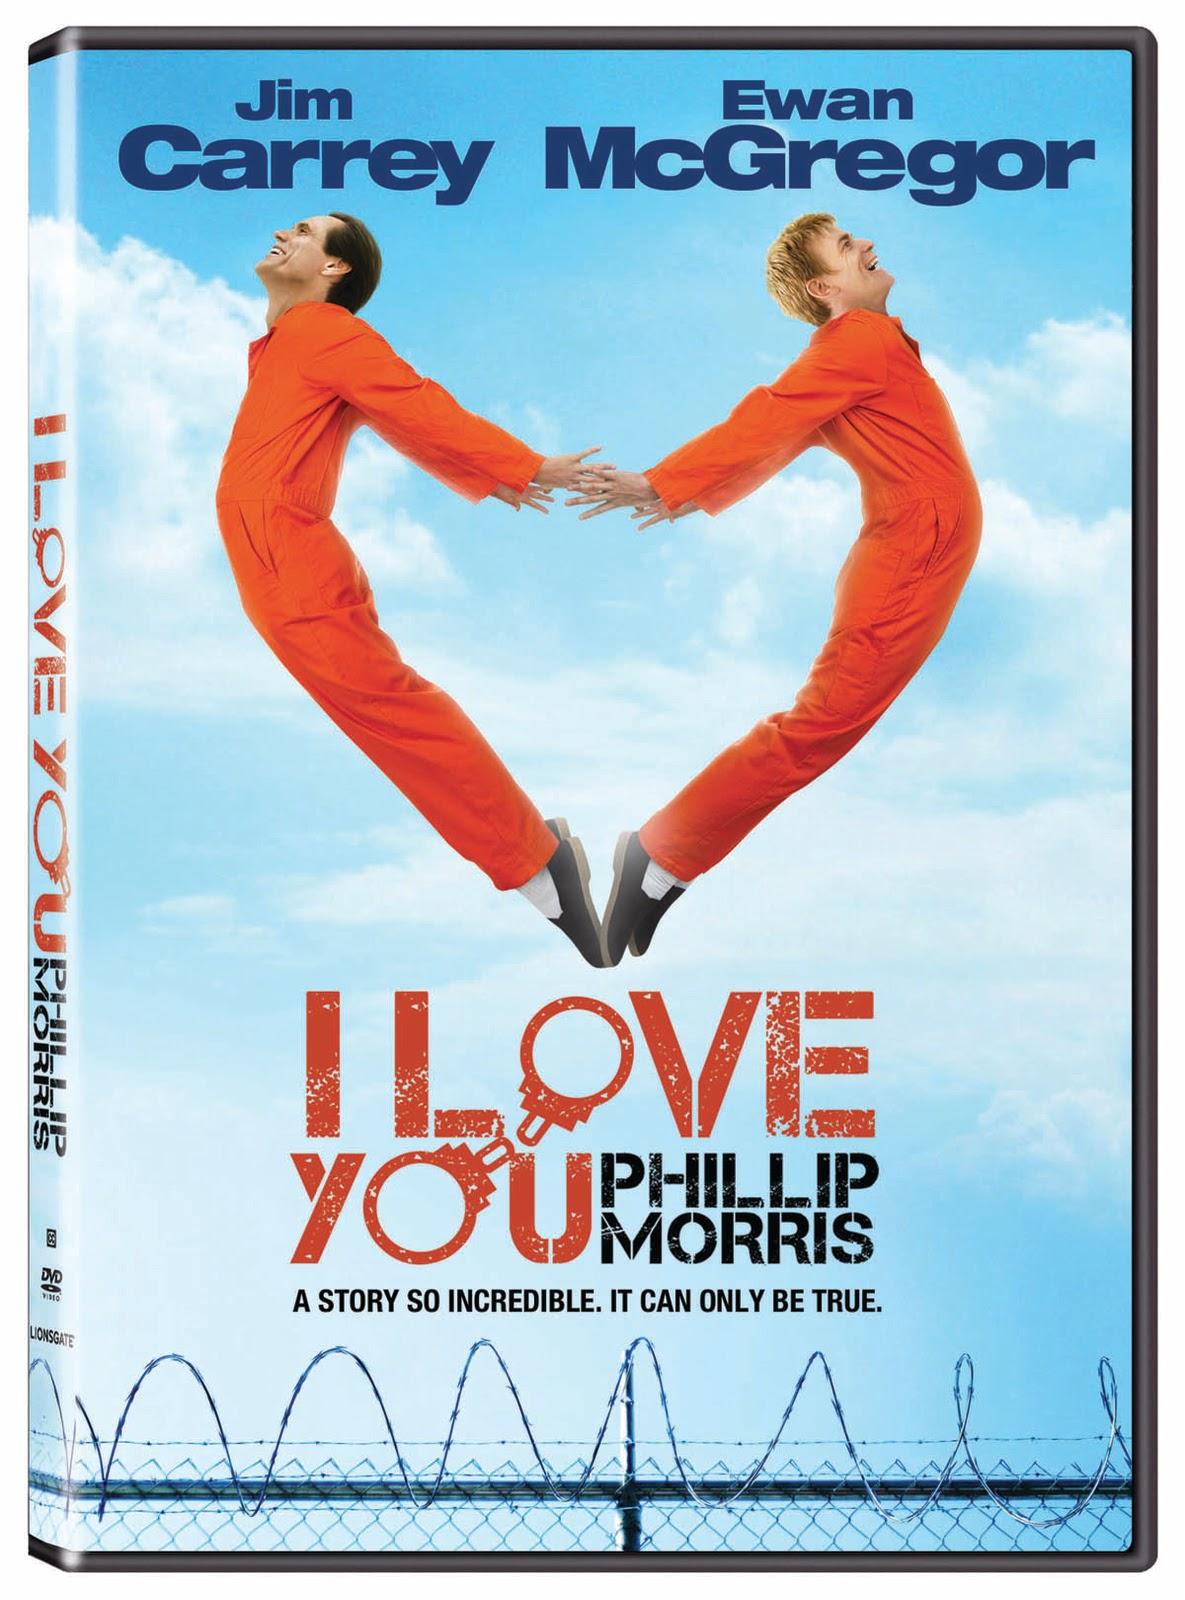 http://2.bp.blogspot.com/-0Xok1hASkrs/TZuP7AKig9I/AAAAAAAAHYA/NAO-MFmjrCg/s1600/Phillip-Morris-DVD-cover.jpg